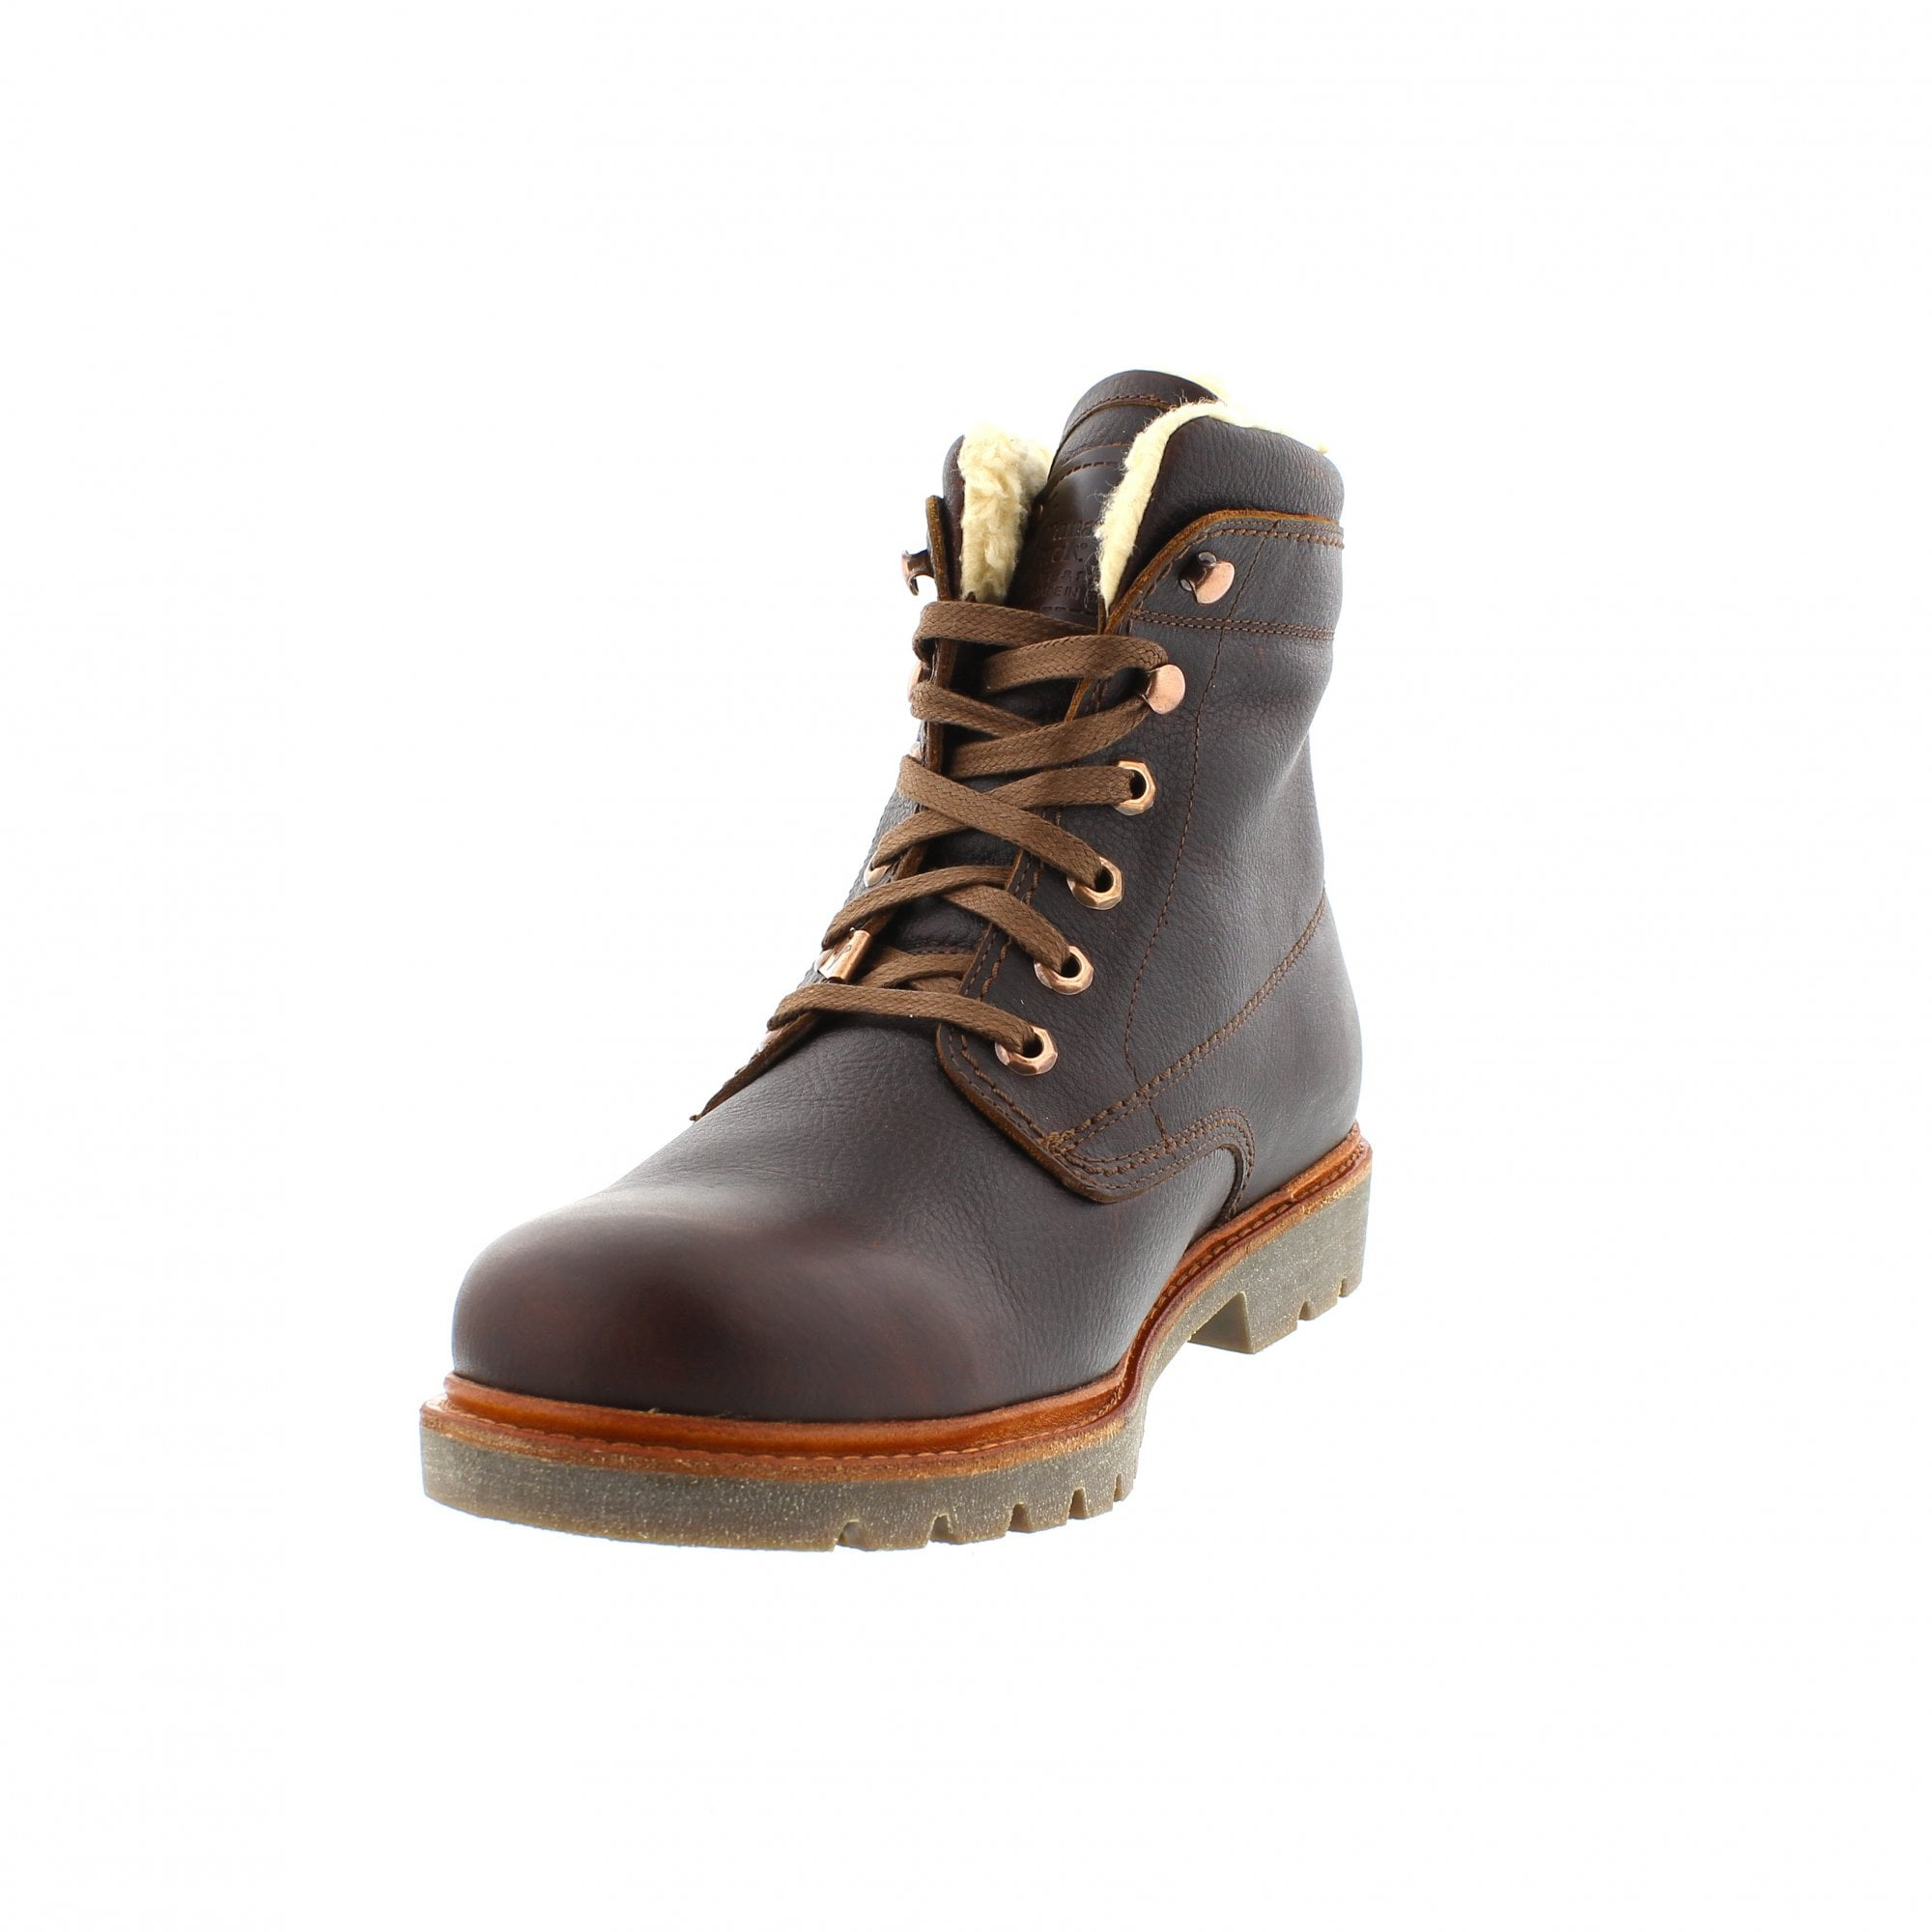 d5348347489 Panama Jack 03 Aviator C23 Mens Ankle Boots